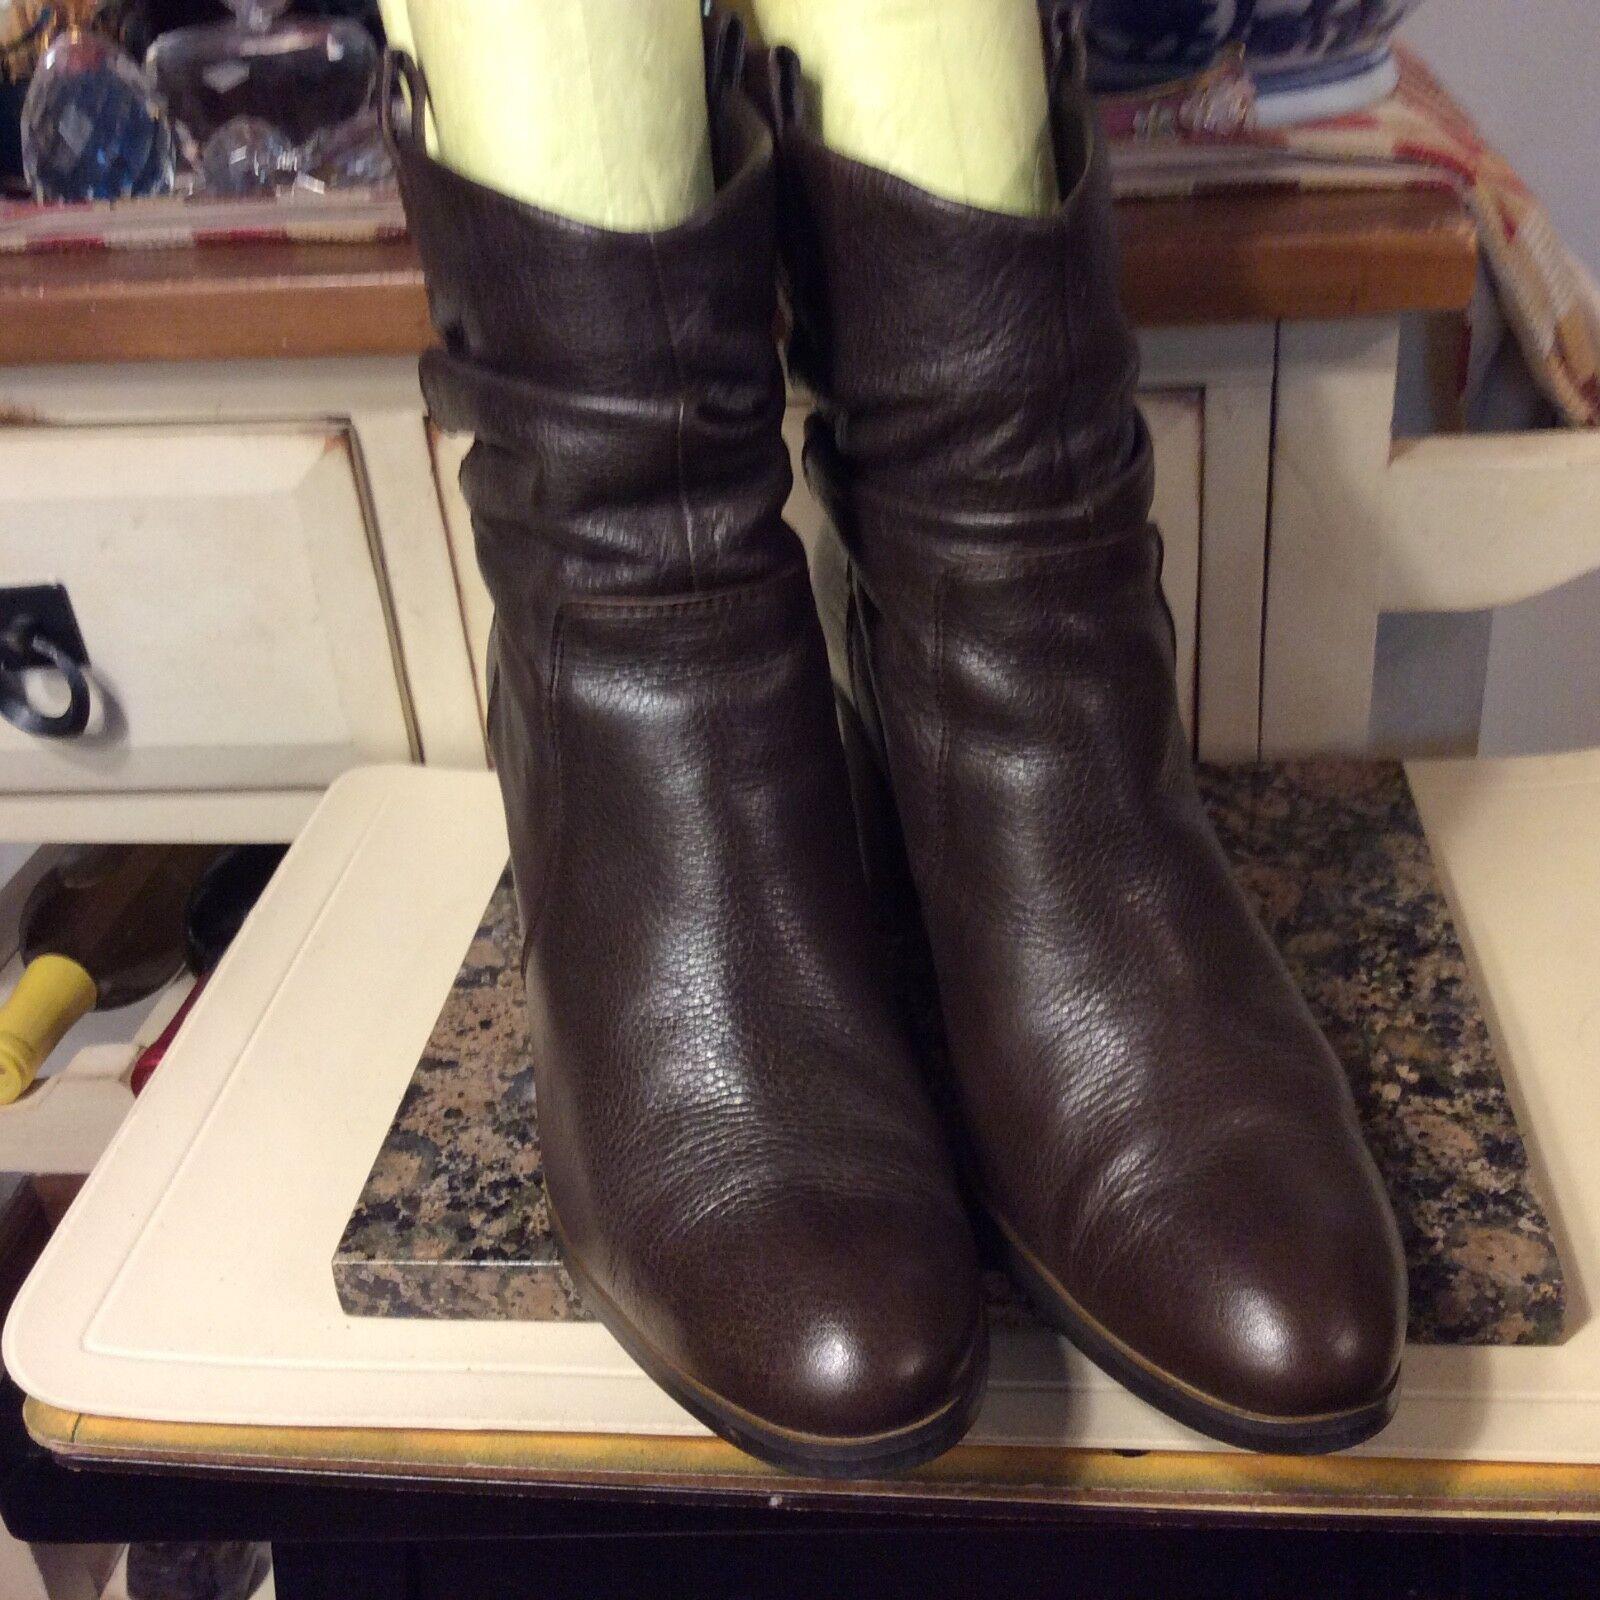 Circa Joan & David KIRSTIN Women's Brown Leather Ankle Boots 9.5